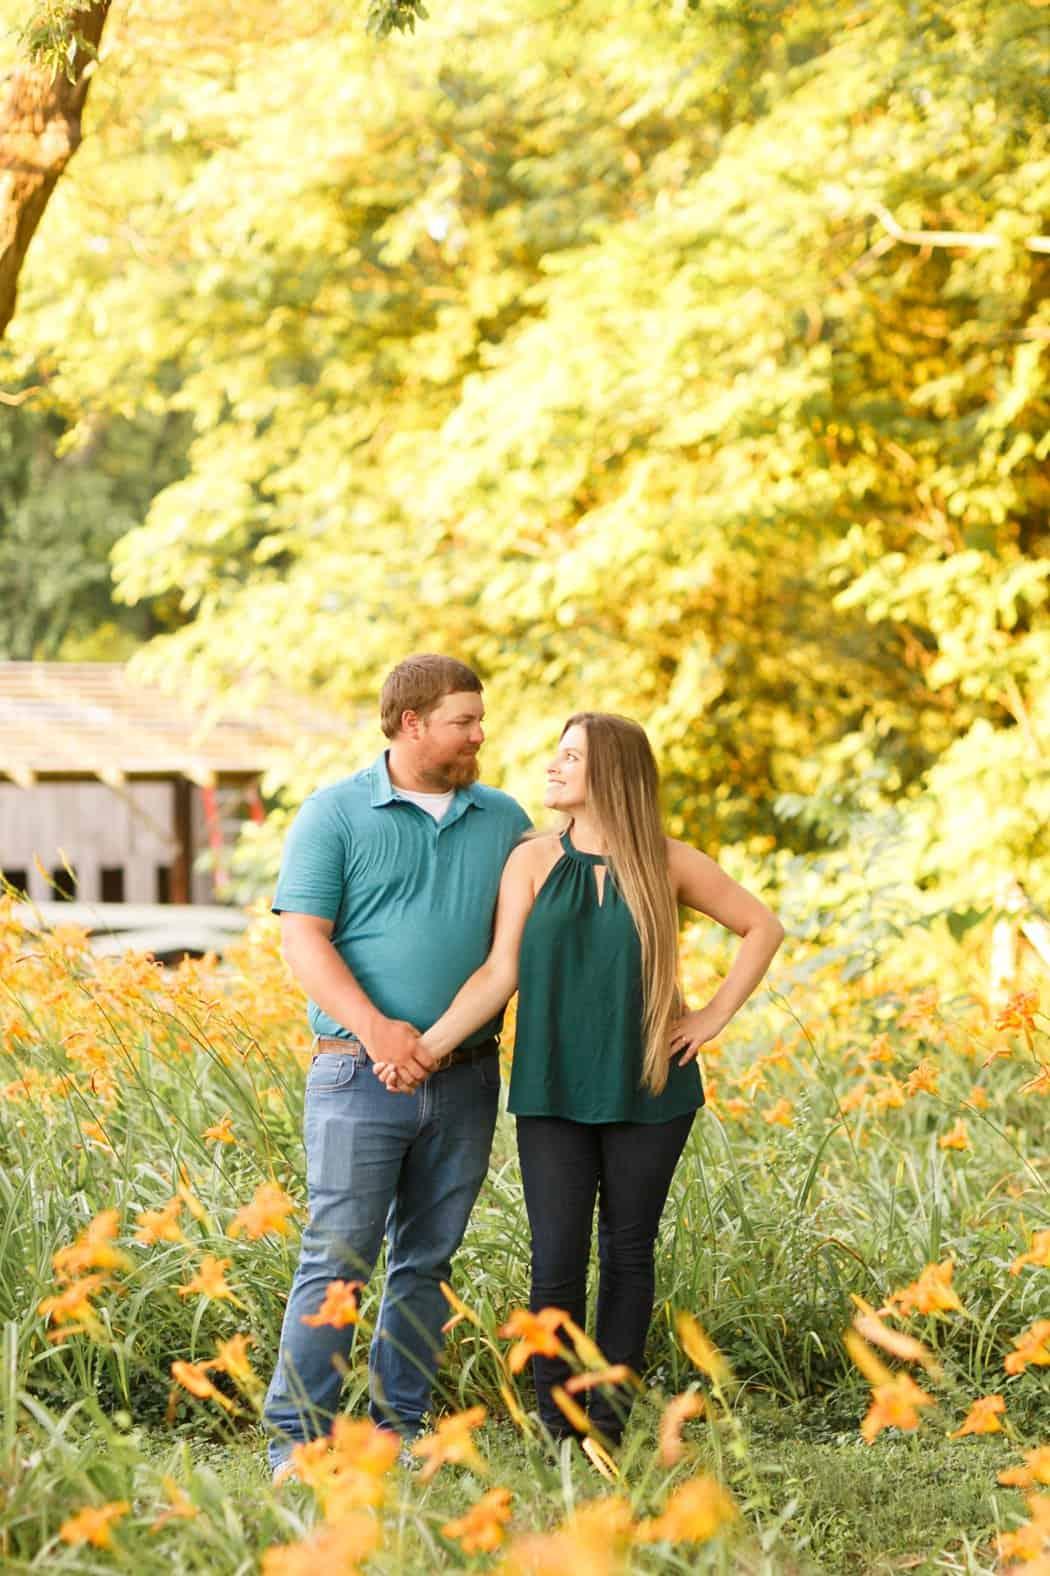 poplar hill wedding and events venue blackstone virginia engagement photos